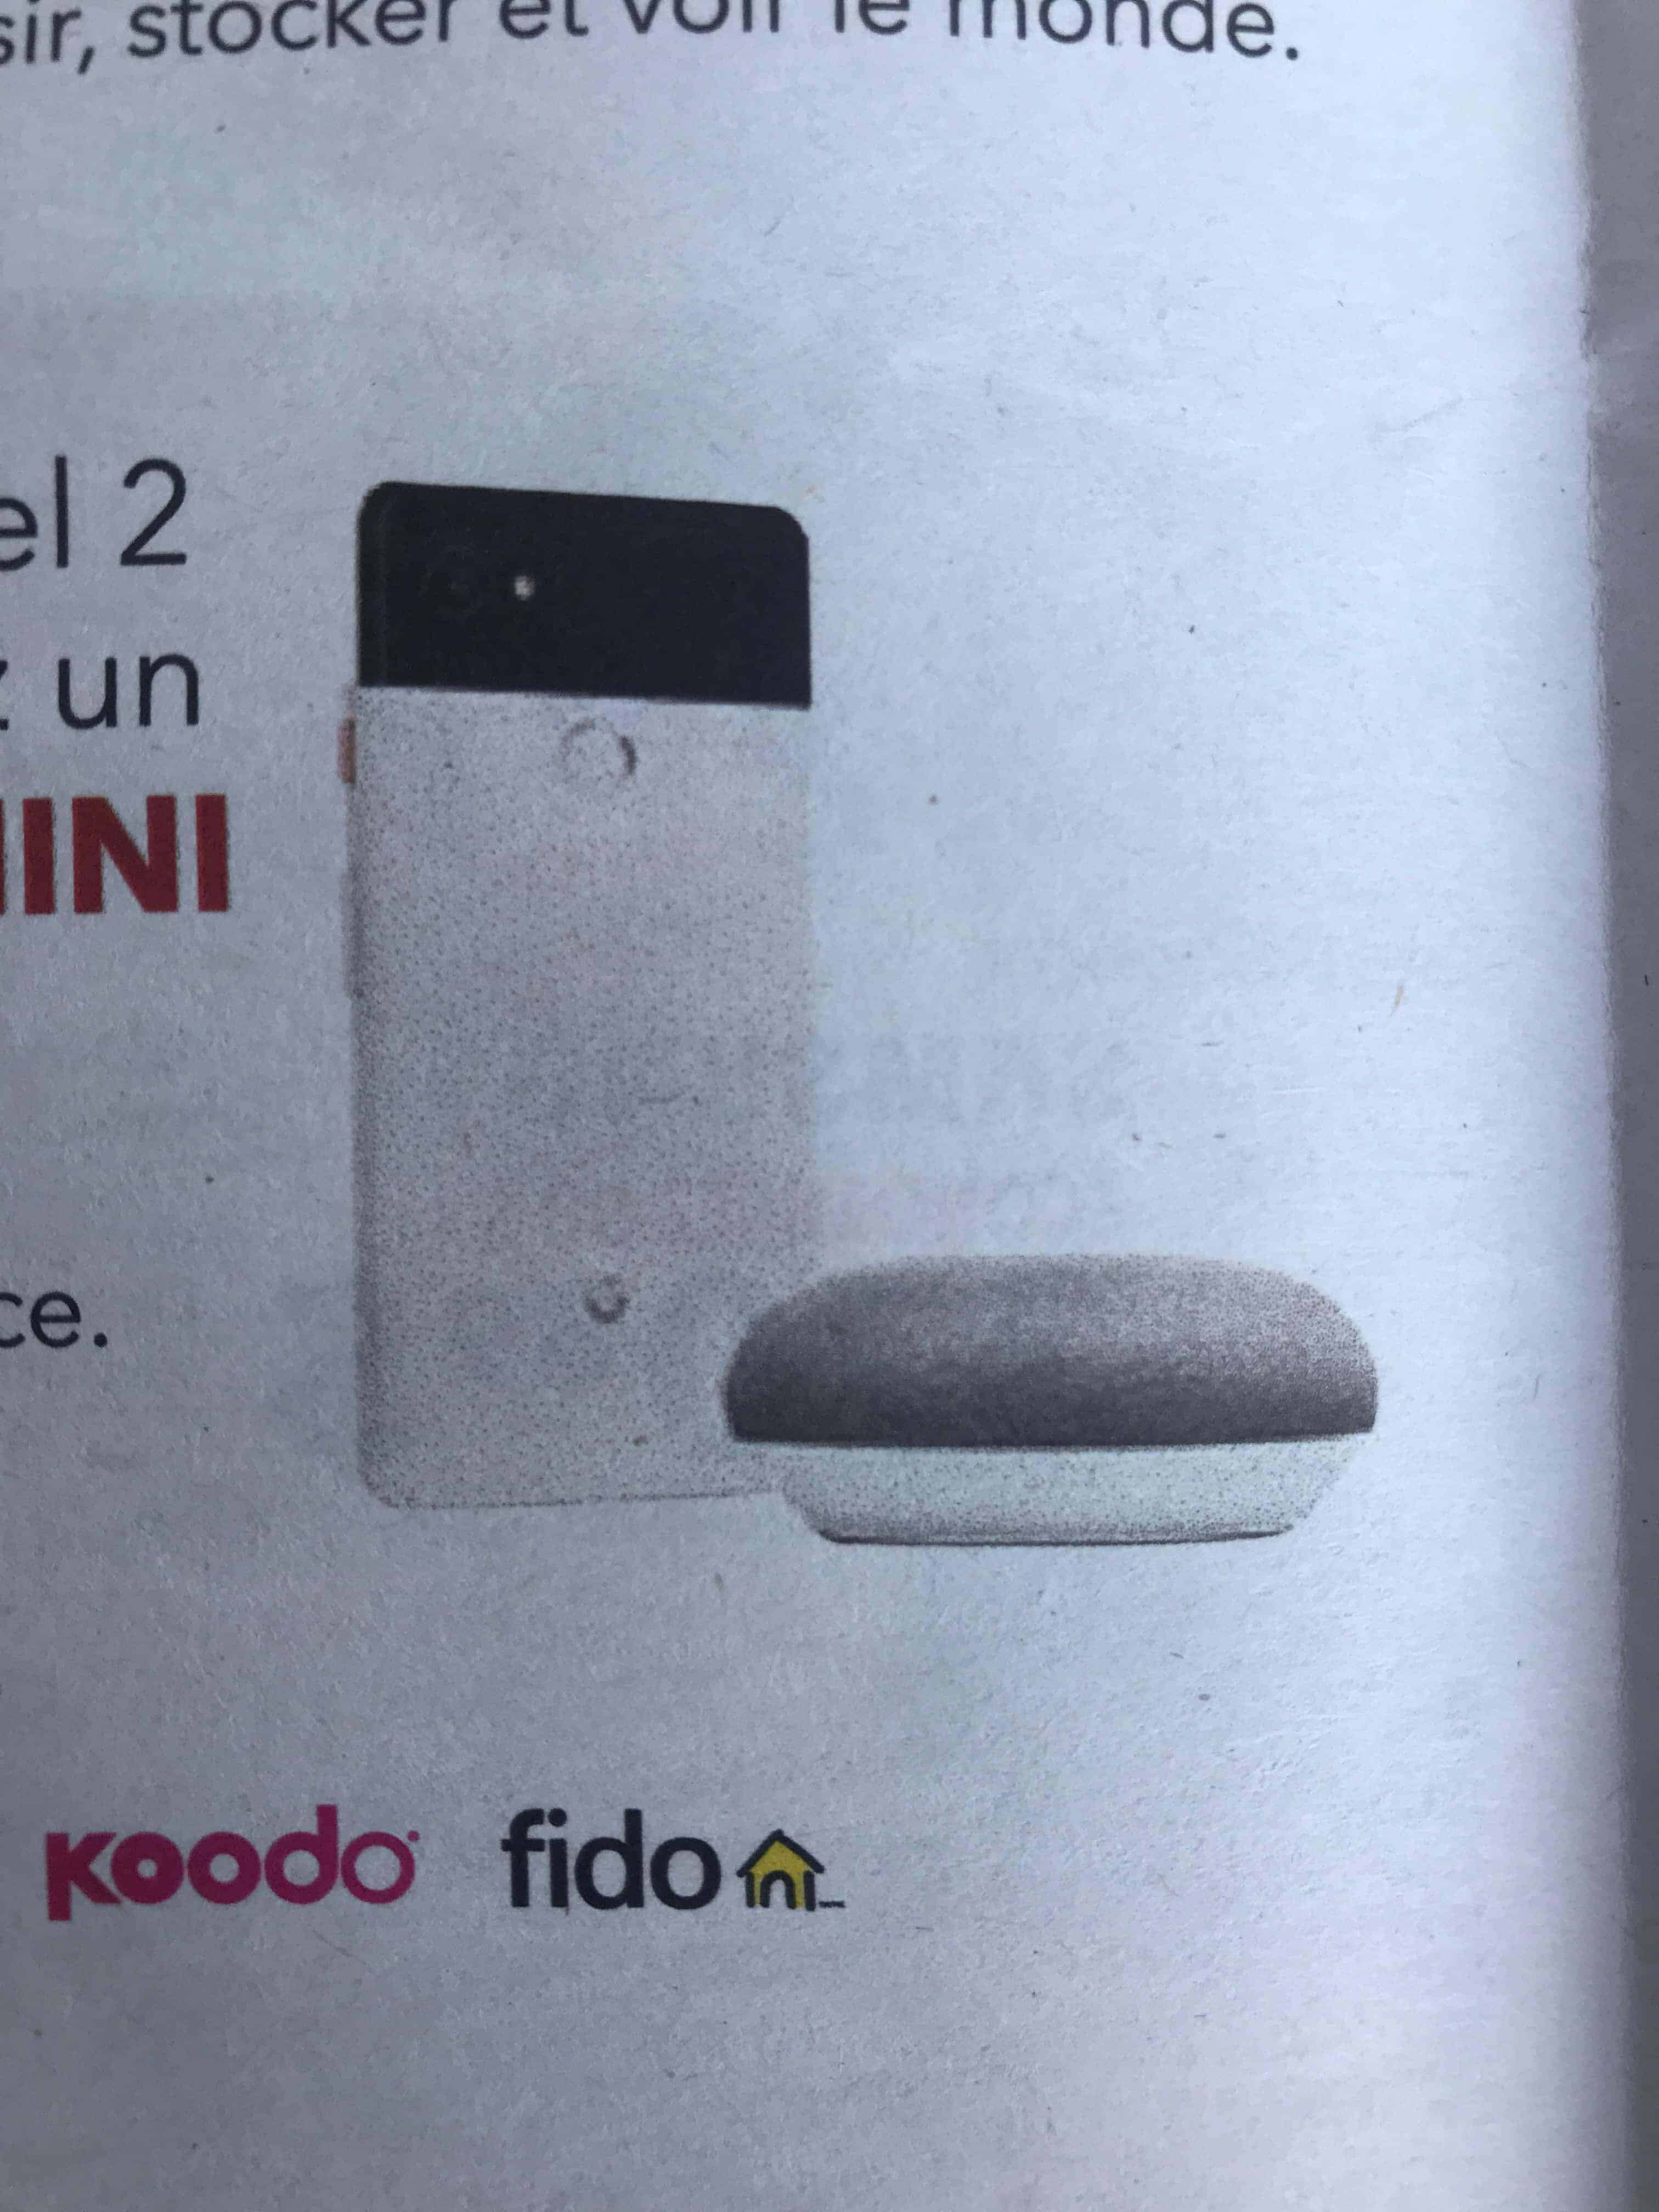 Pixel 2 Best Buy Ads 6